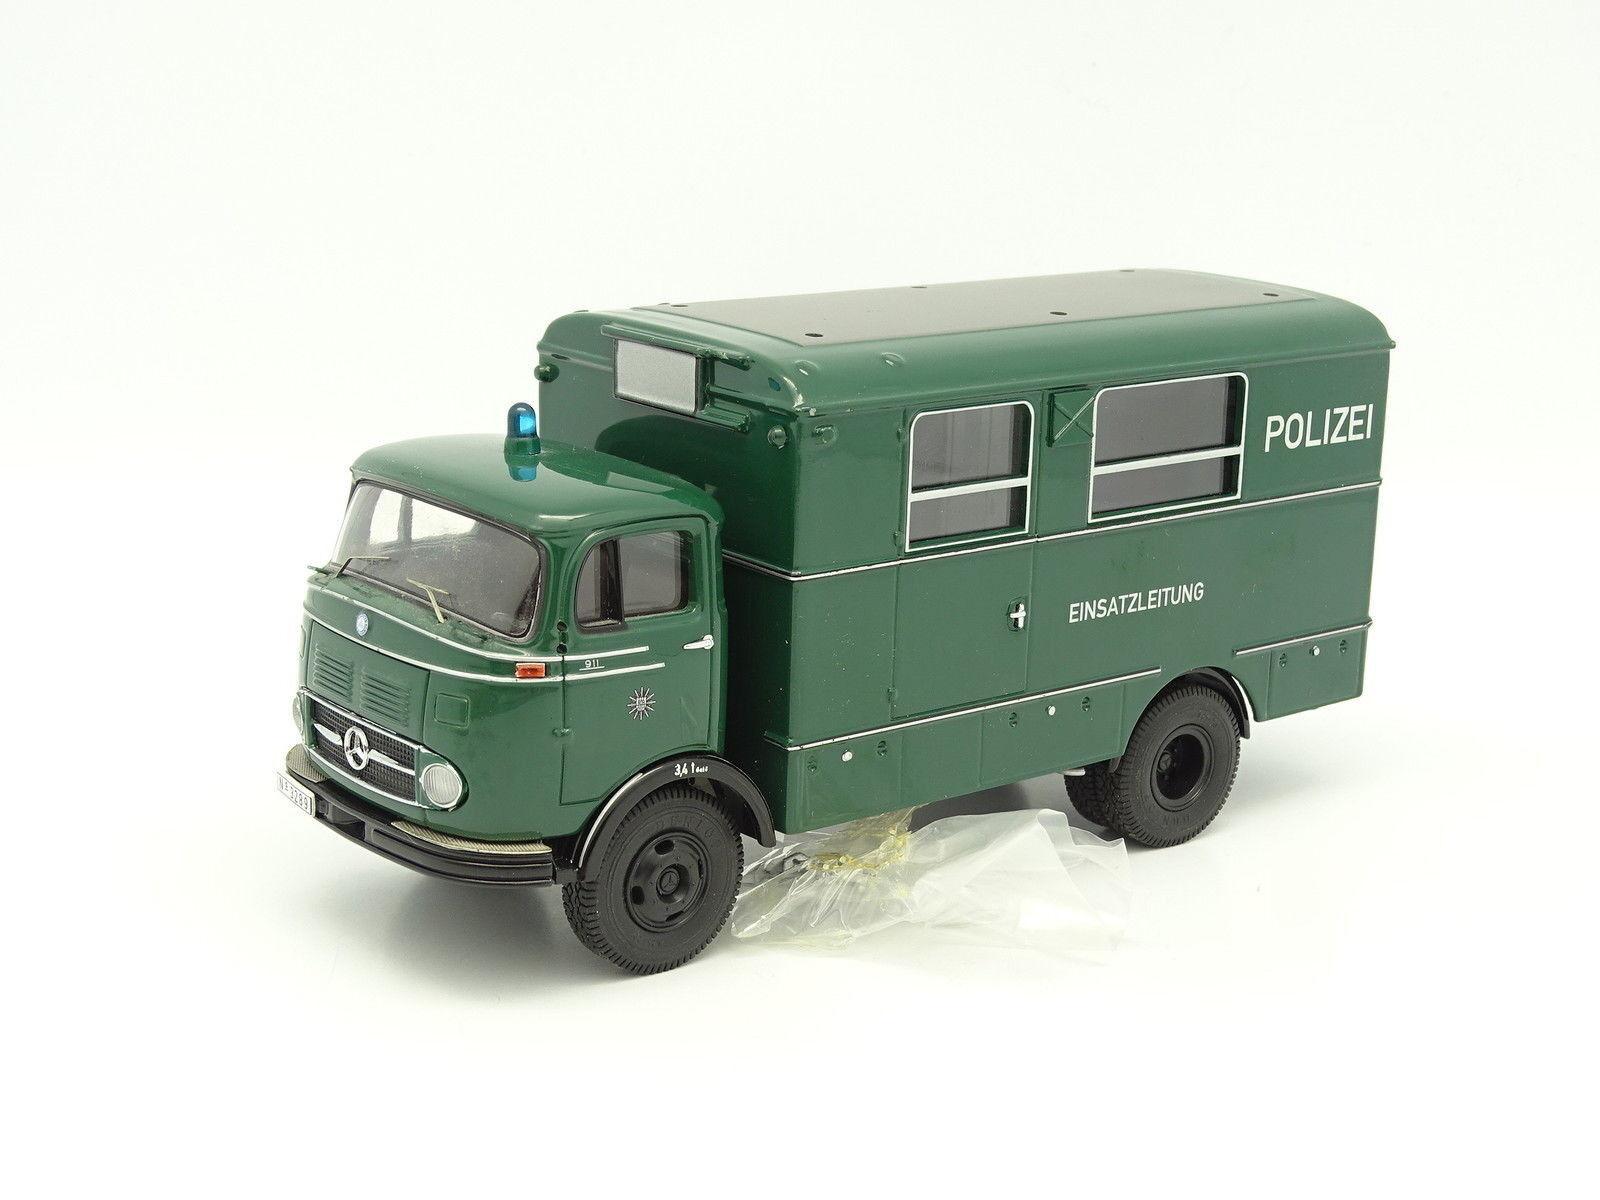 Premium Classixxs SB 1 43 - Mercedes LP911 Fourgon Cellulaire Polizei